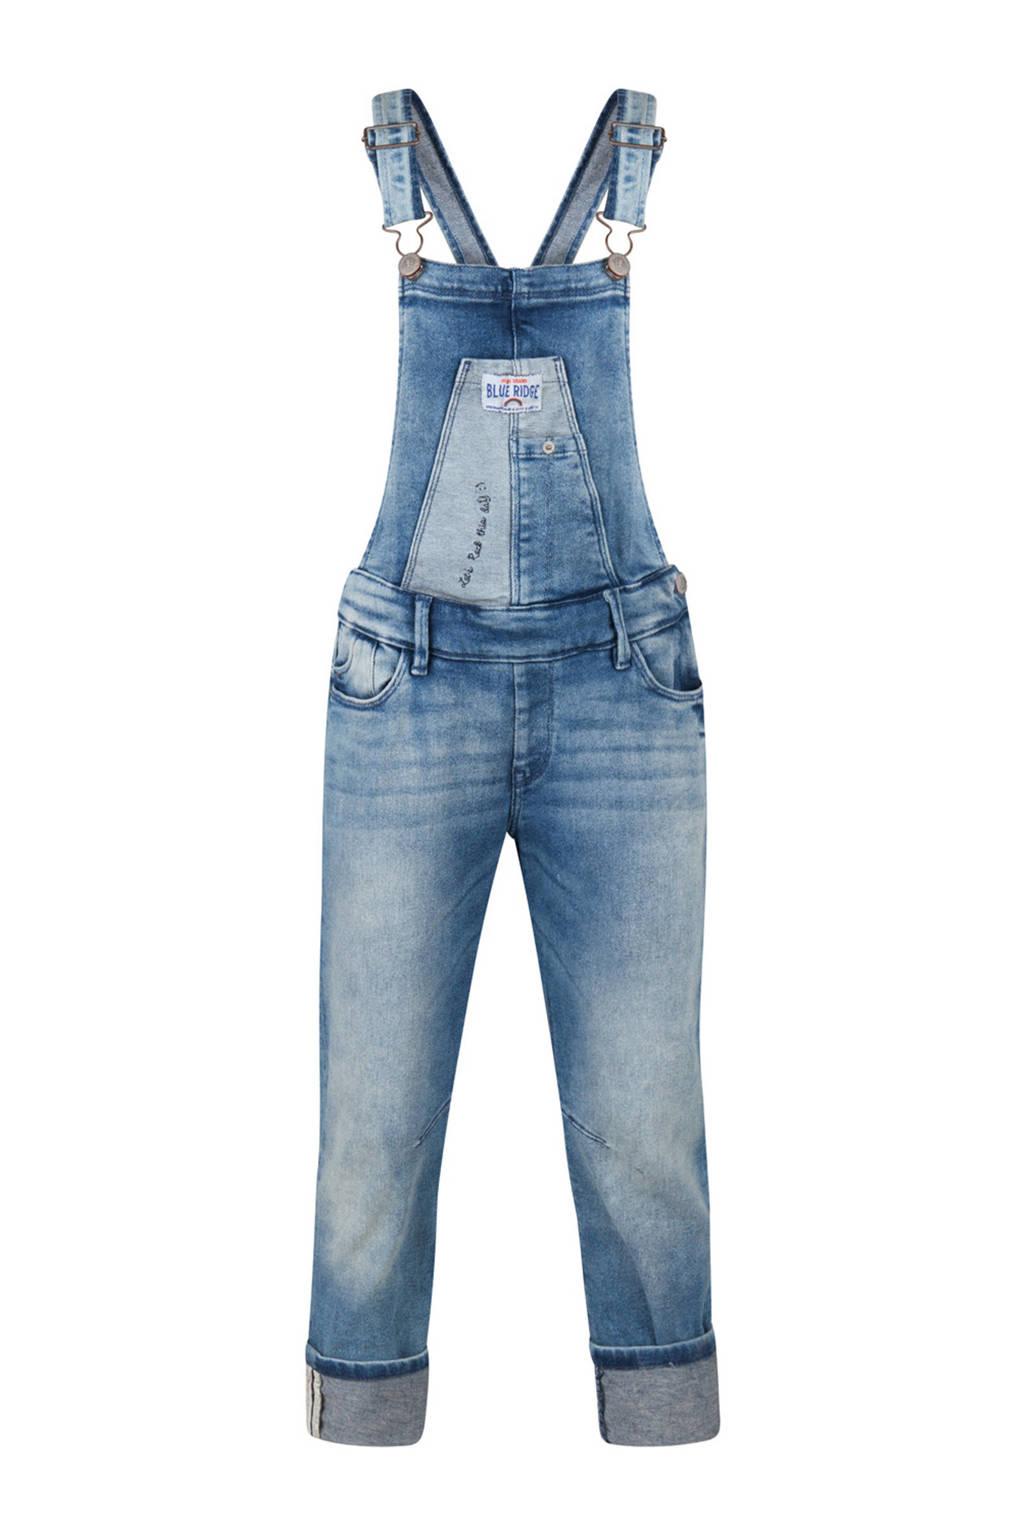 WE Fashion Blue Ridge straight fit tuinbroek, Stonewashed